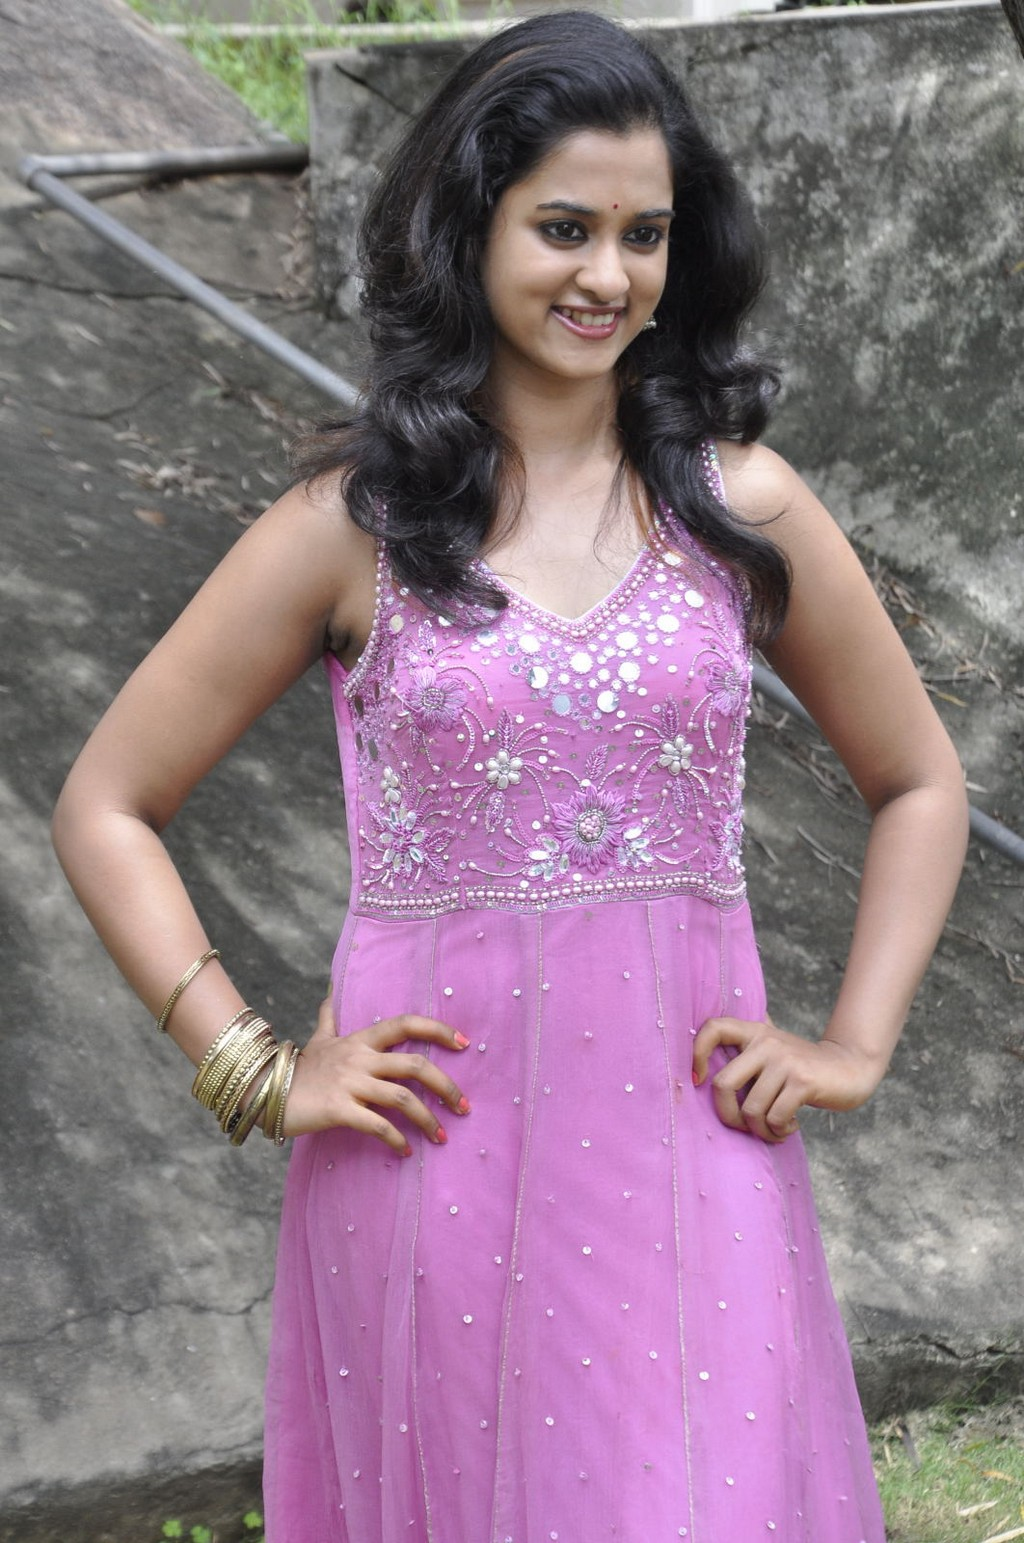 Hot Star Pic: Ranjini Haridas Ranjini Haridas Drunken Ranjini Idea star singer ranjini hot photos